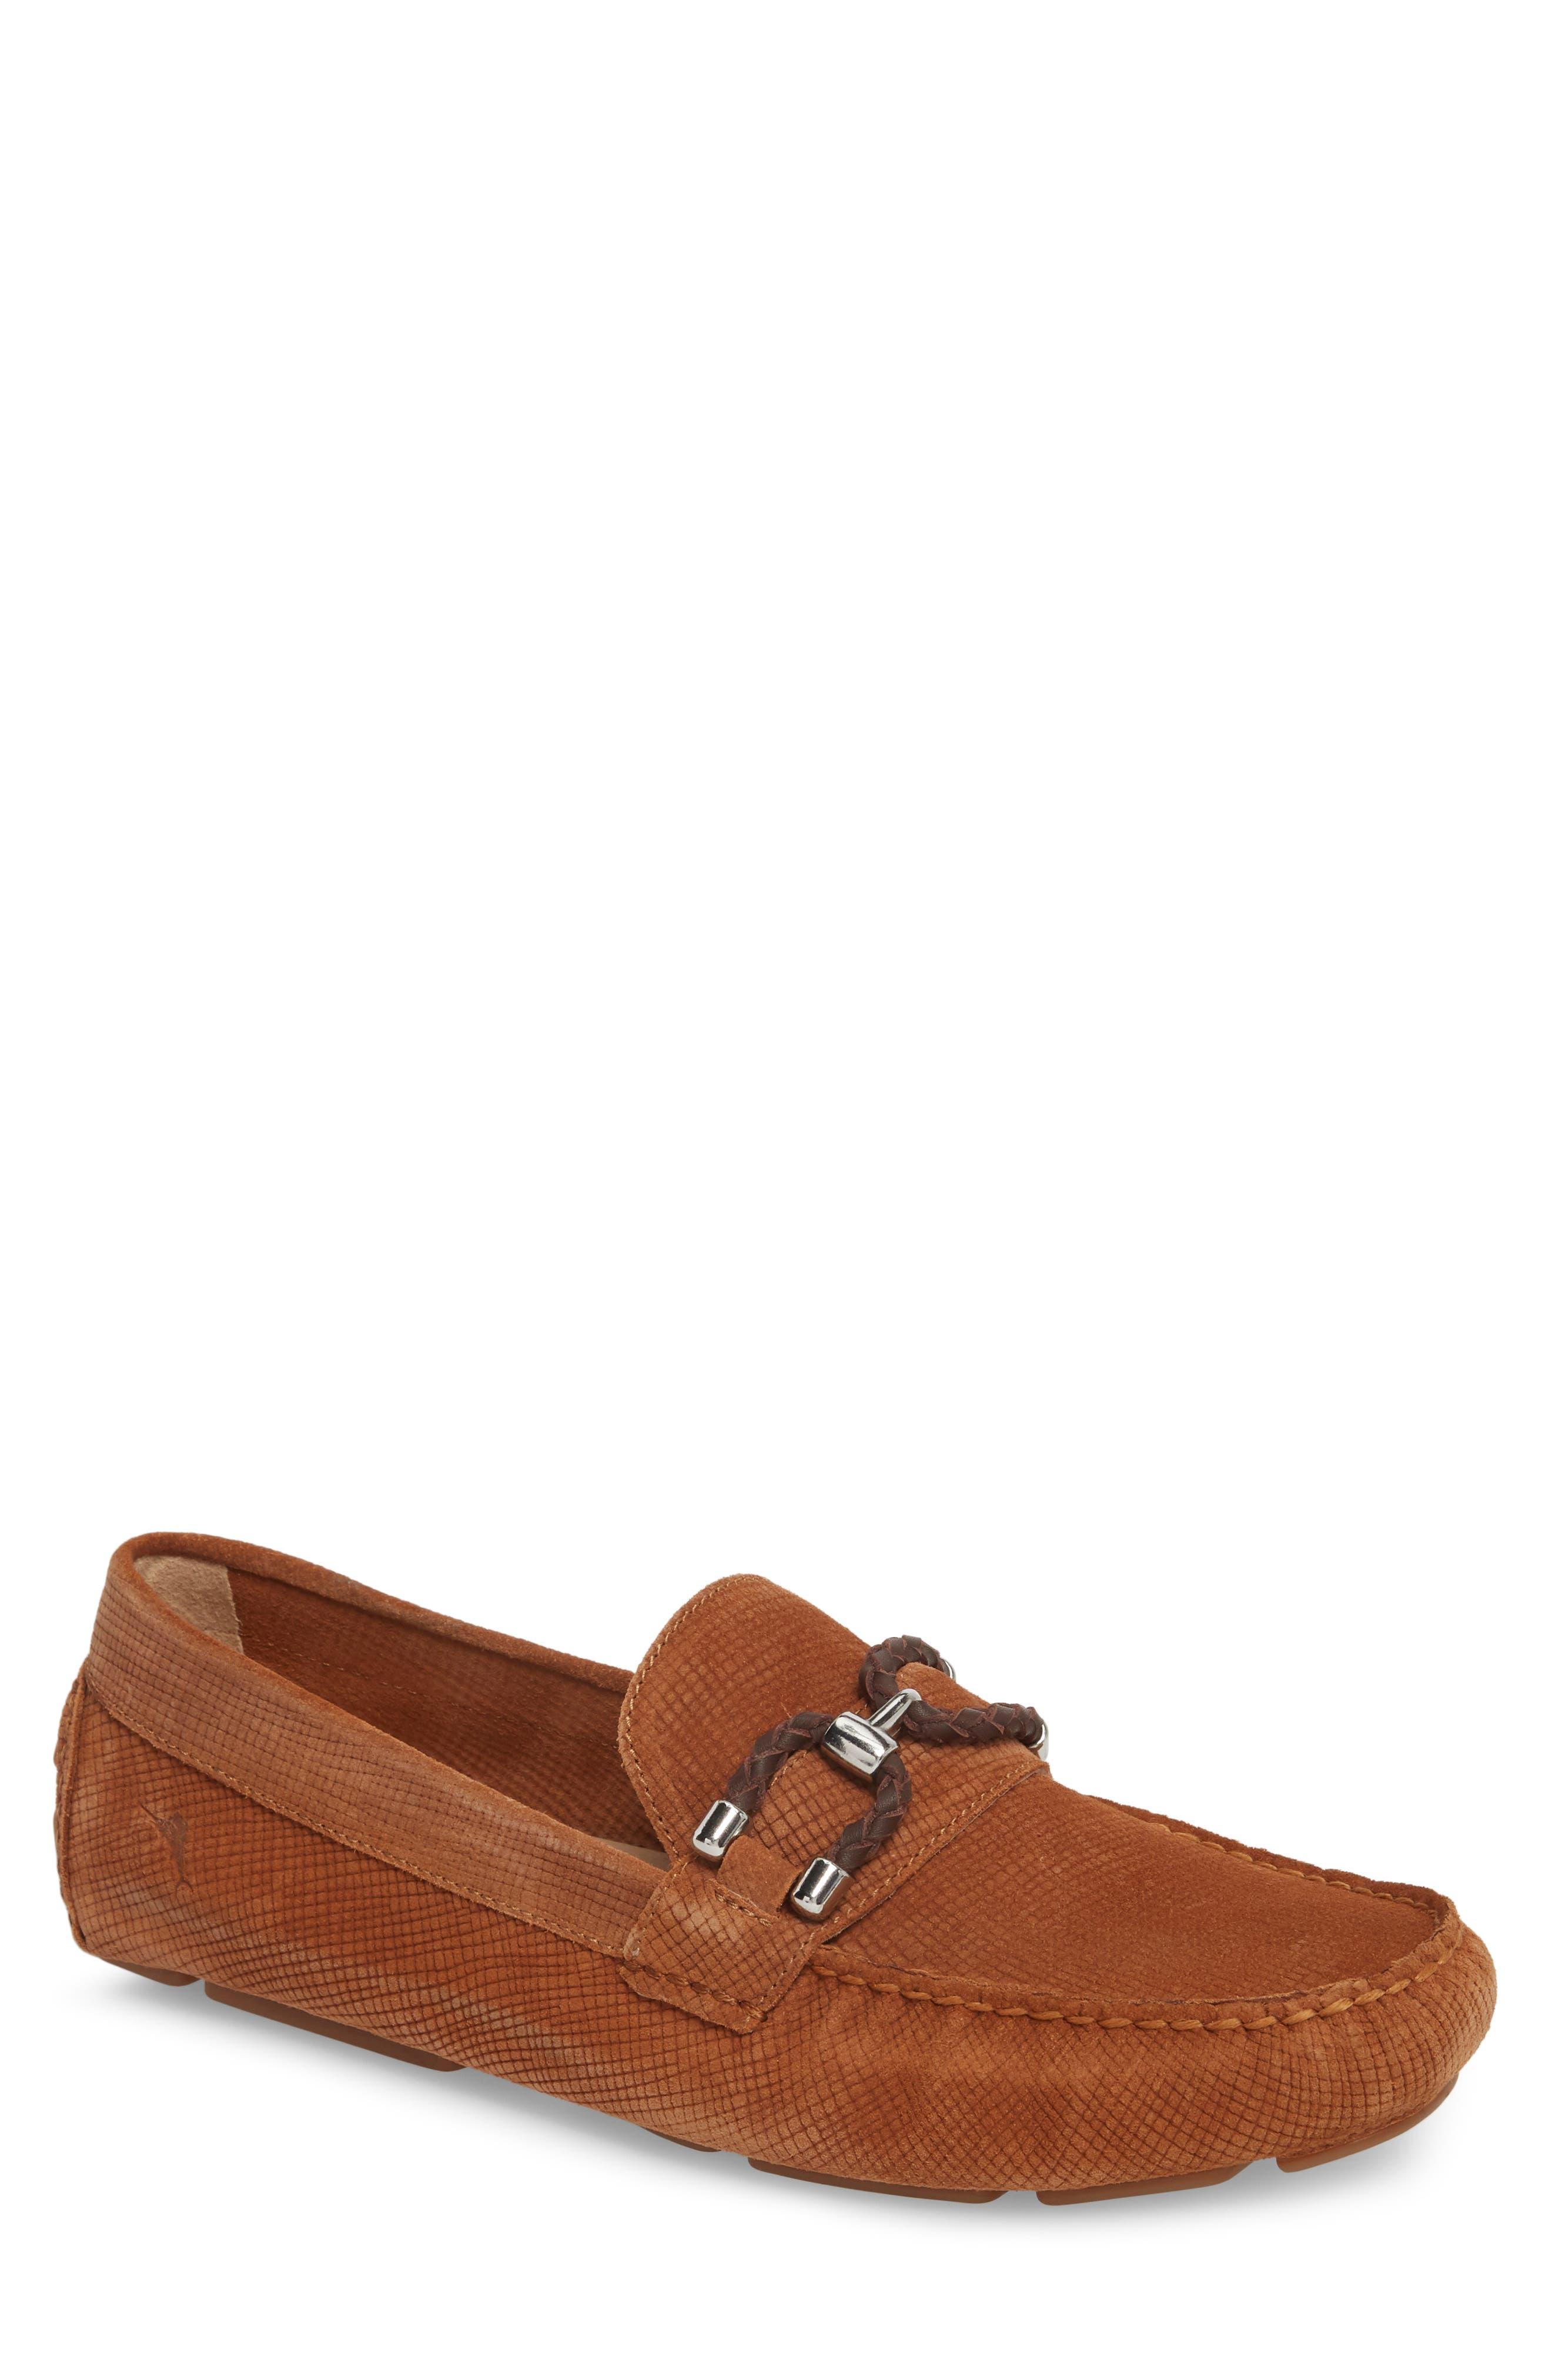 Galen Bit Driving Shoe,                         Main,                         color, Light Brown Suede